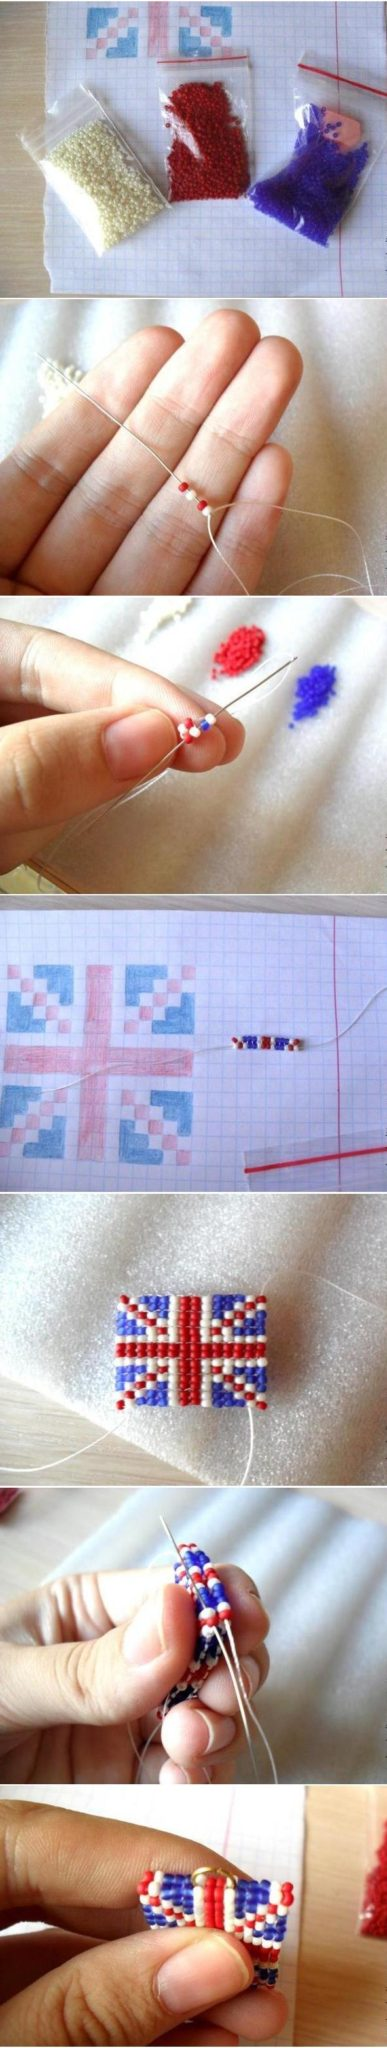 Серьги из бисера с британским флагом: мастер-класс